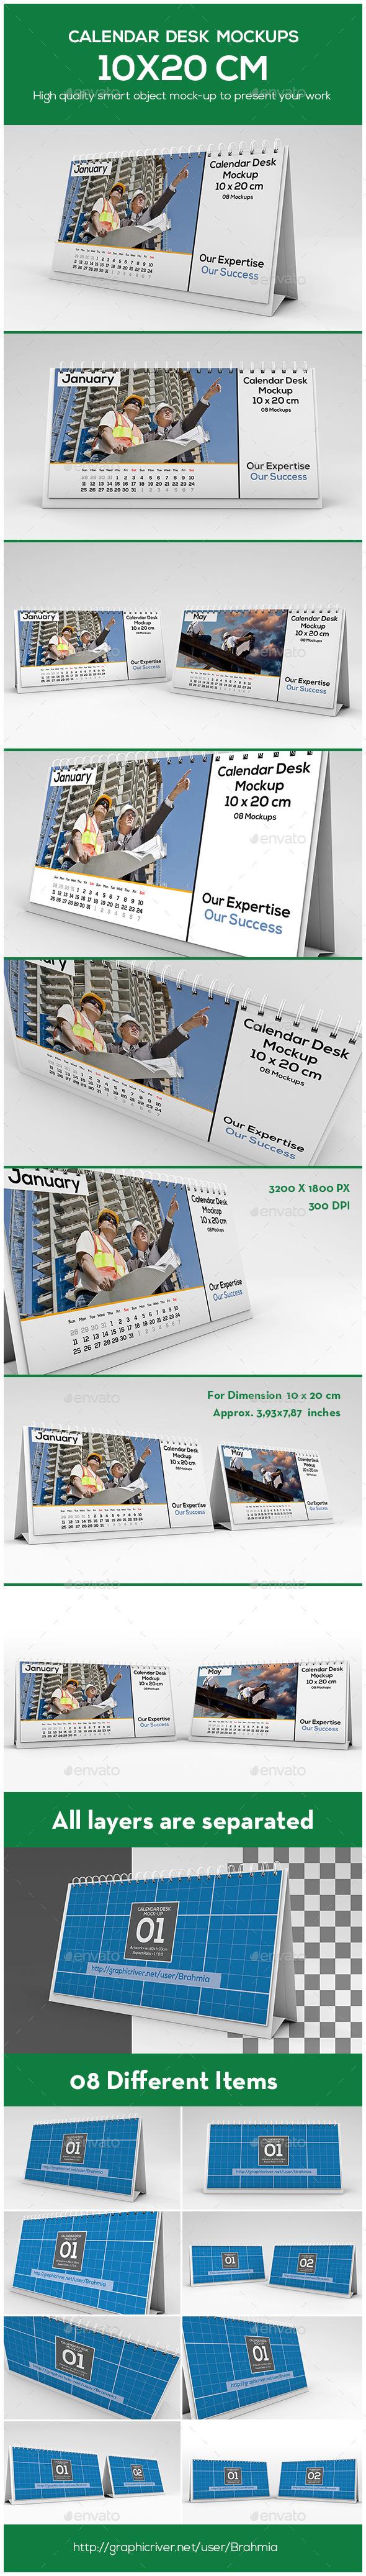 Calendar Desk Mockups For 10x20 cm - Miscellaneous Print